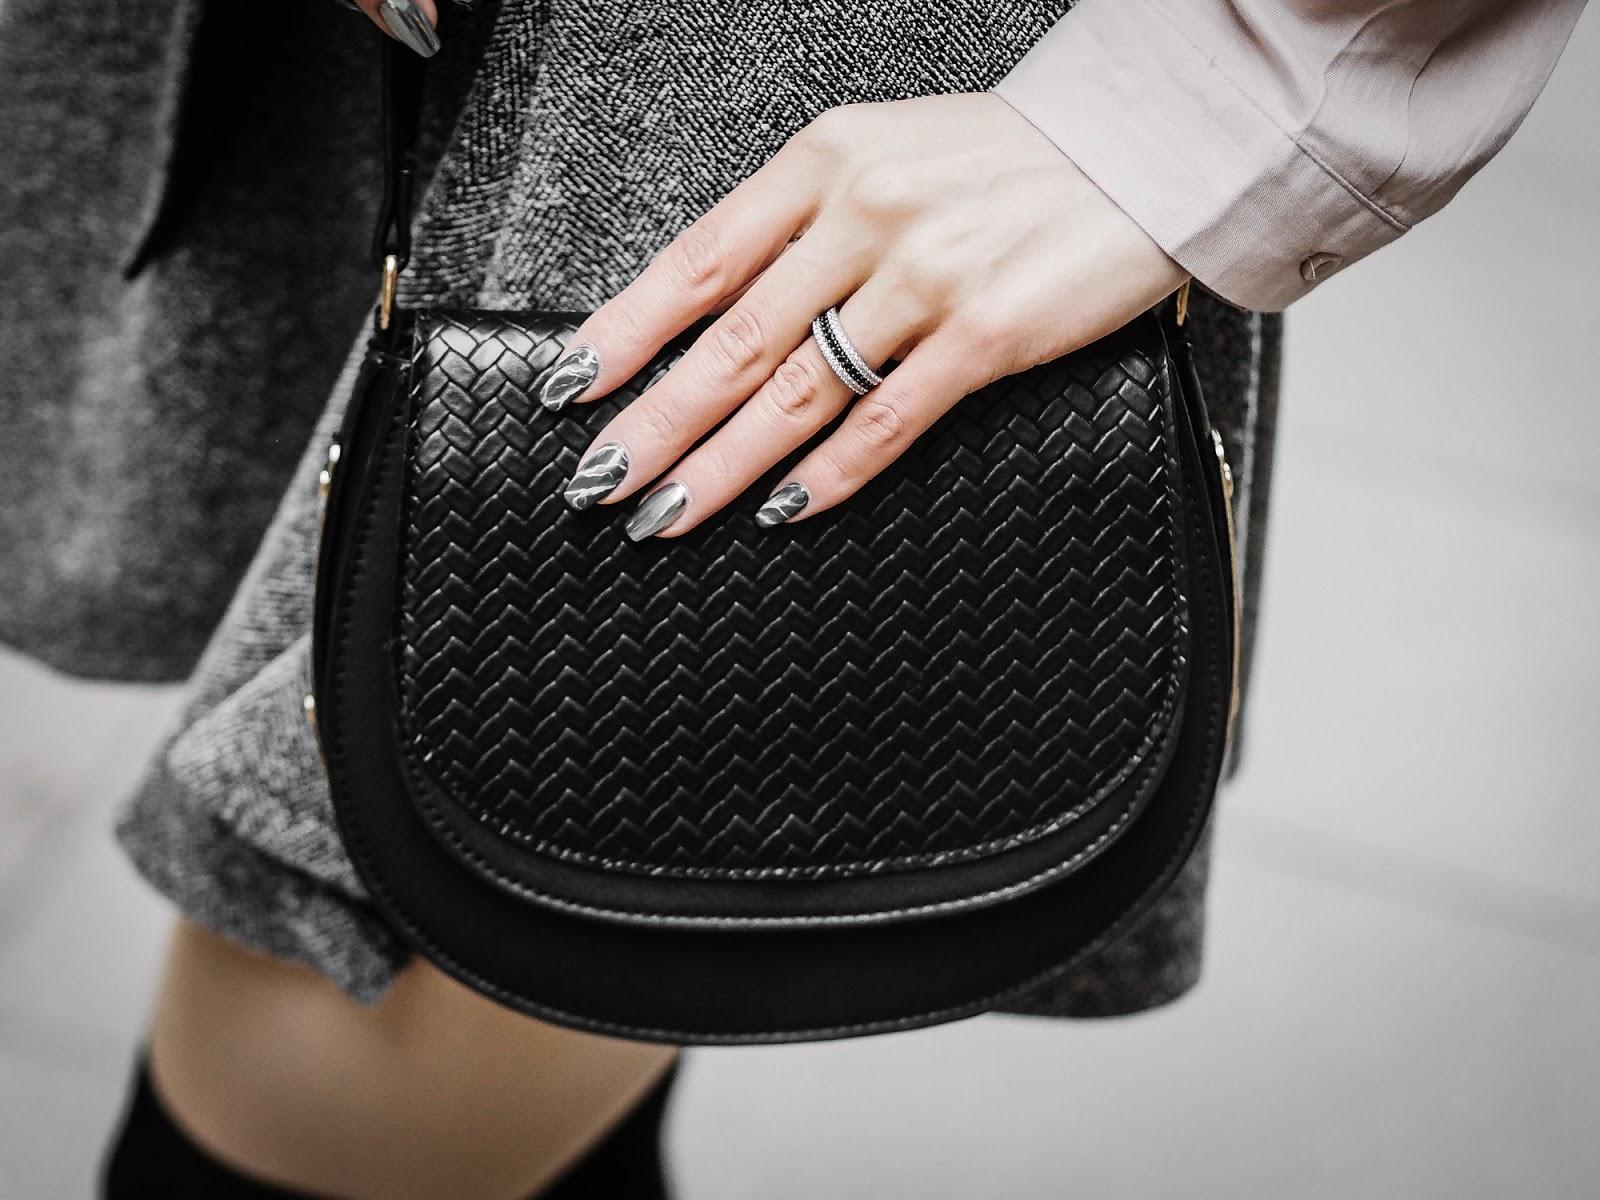 musta laukku kynnet marmori